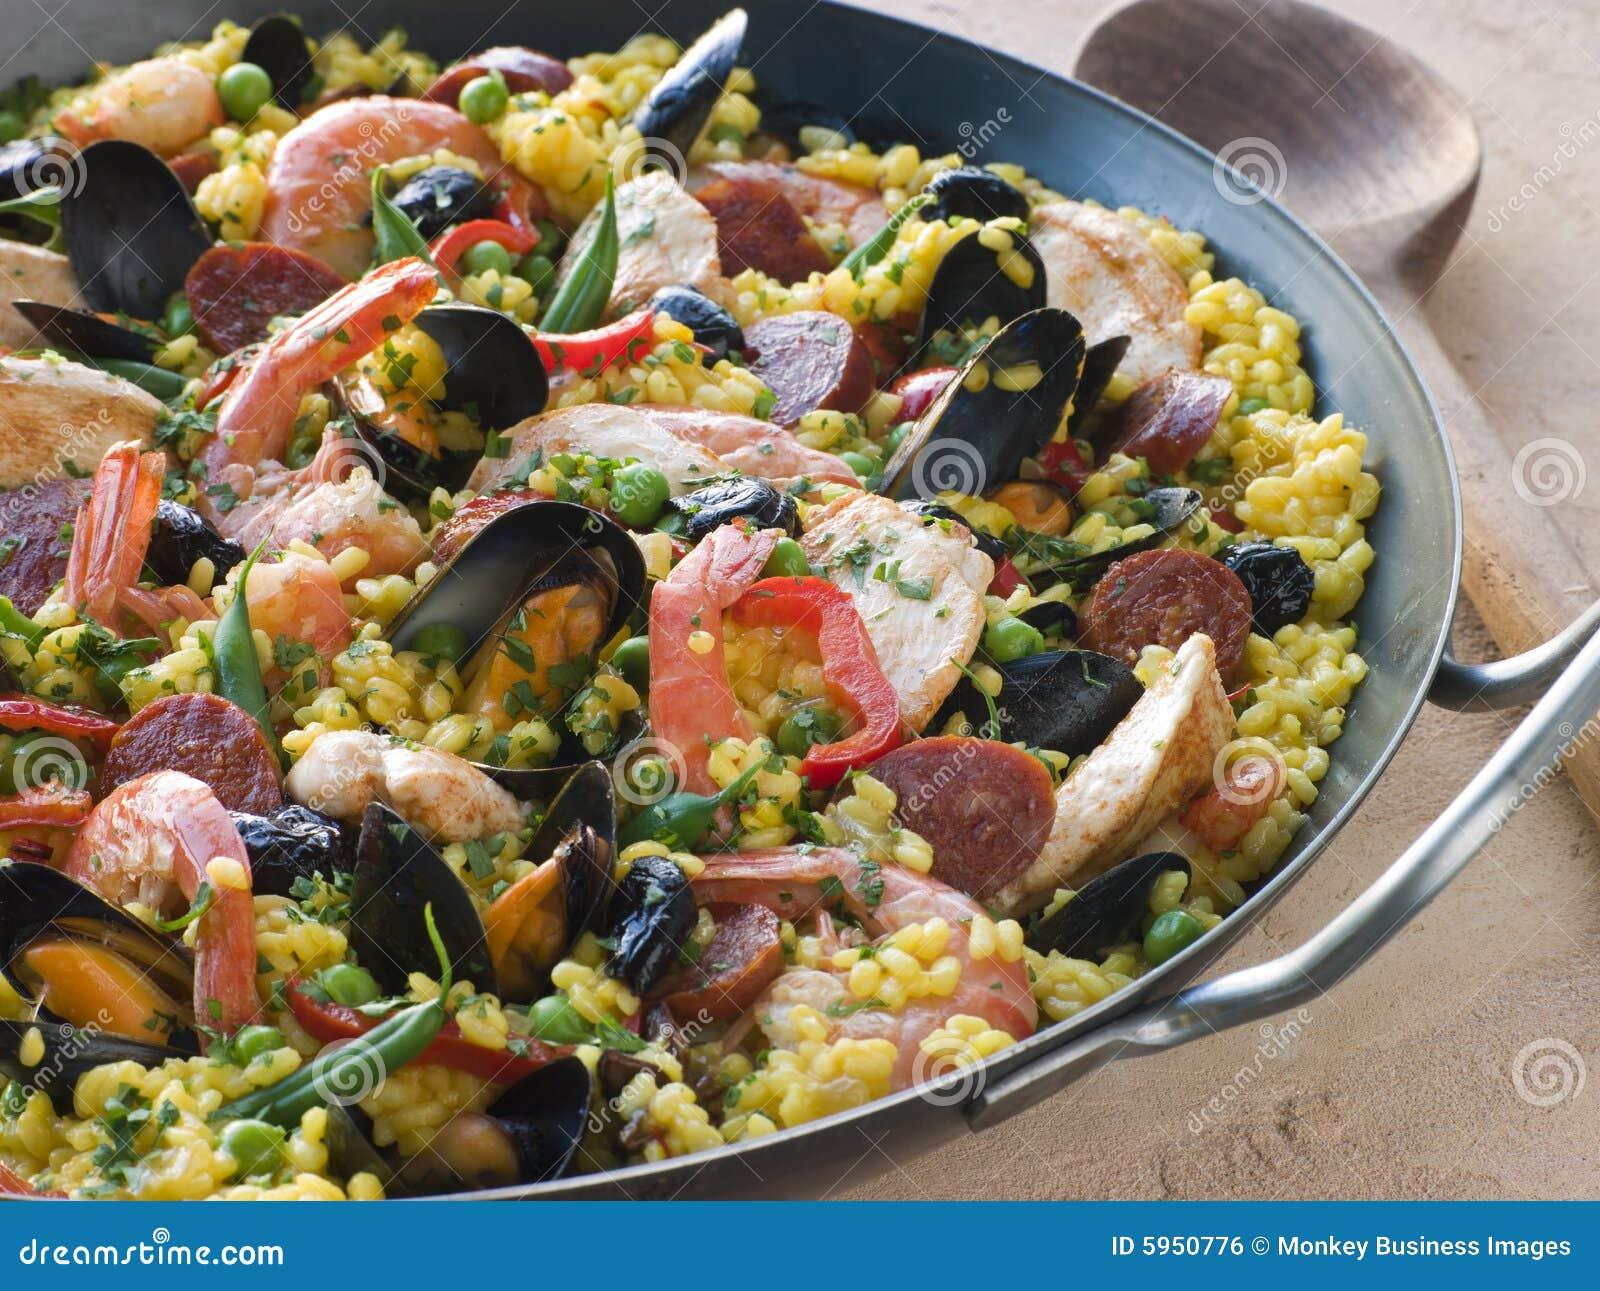 Valencian Paella In A Paella Pan Stock Photo - Image of ...